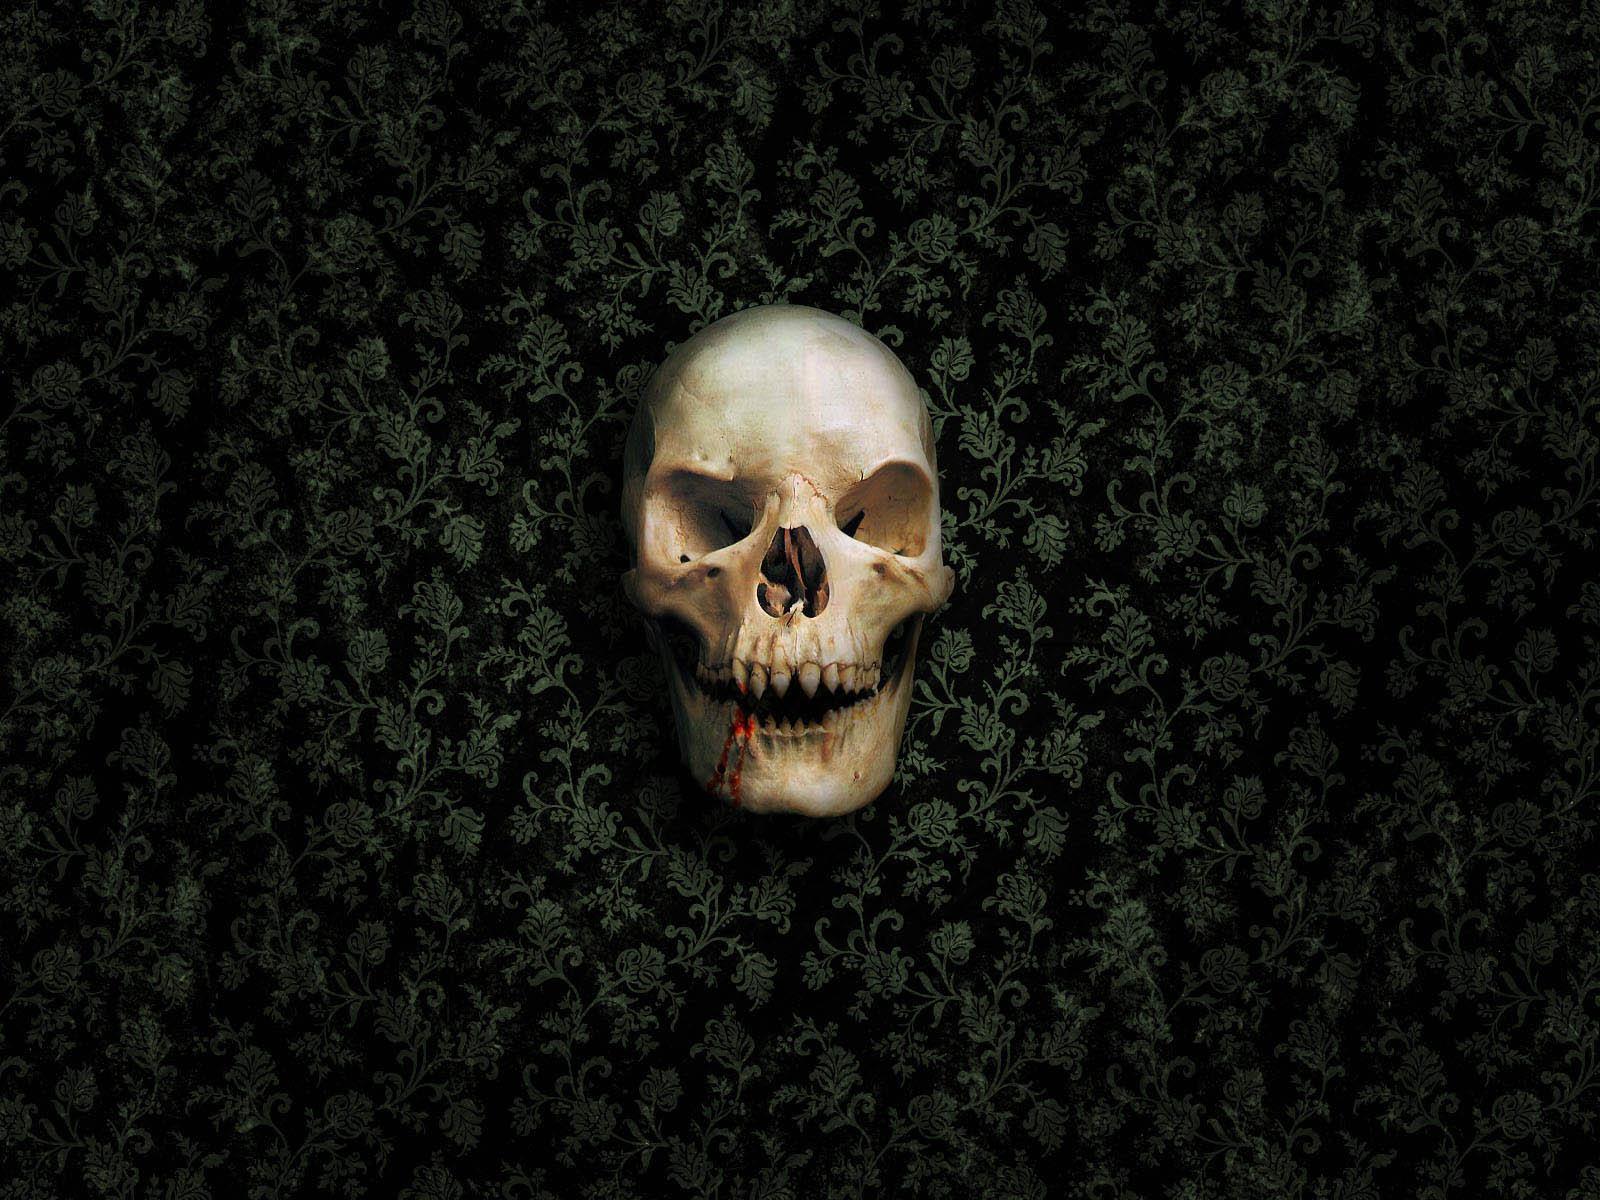 wallpapers: Horror Skull Wallpapers